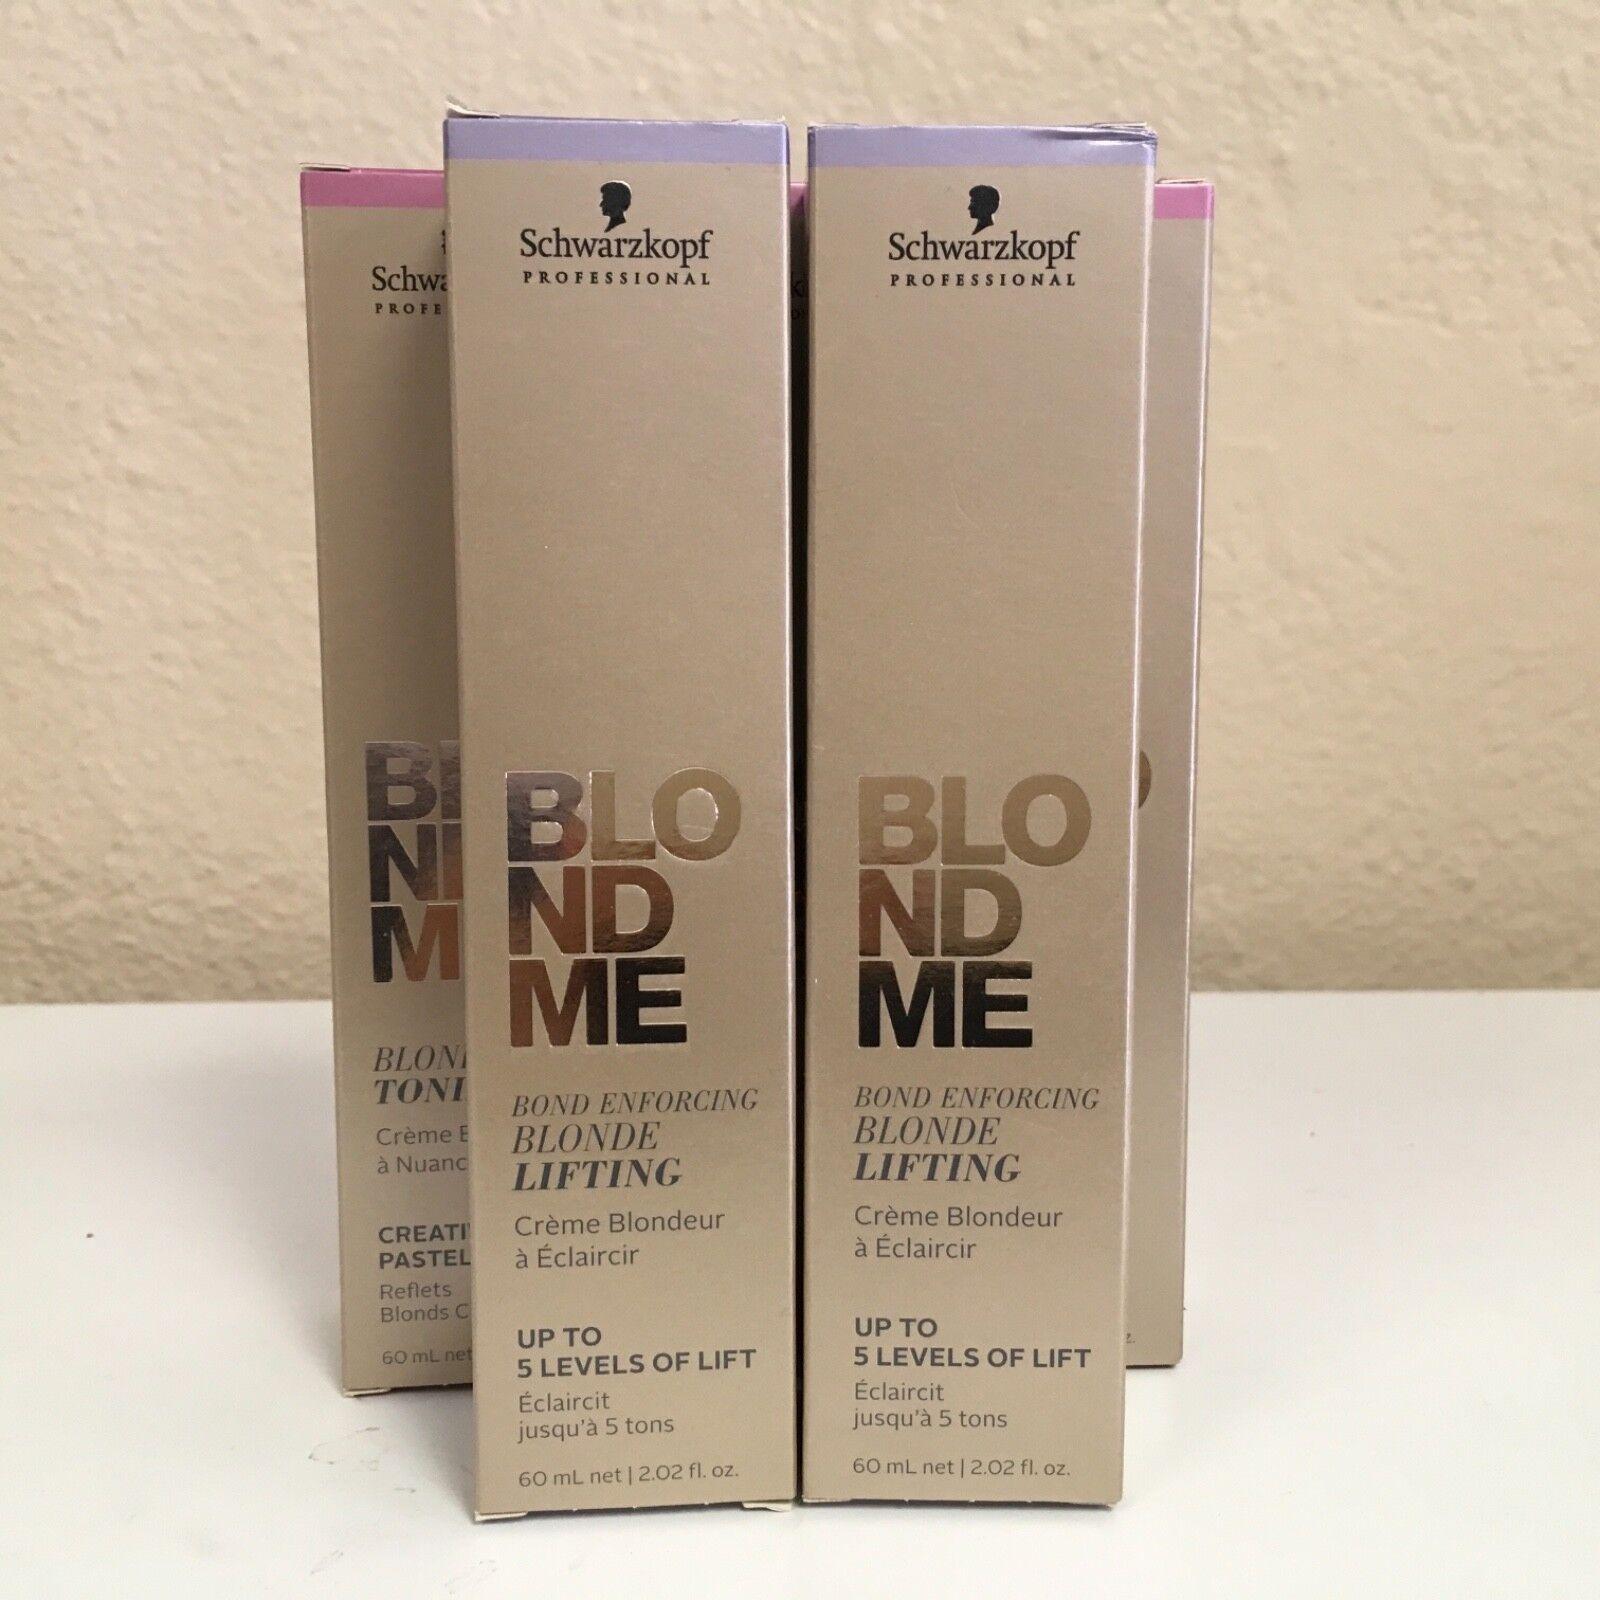 Schwarzkopf Blondme Blonde Lifting Hair Color Cream 60ml NIB ~YOU CHOOSE!~